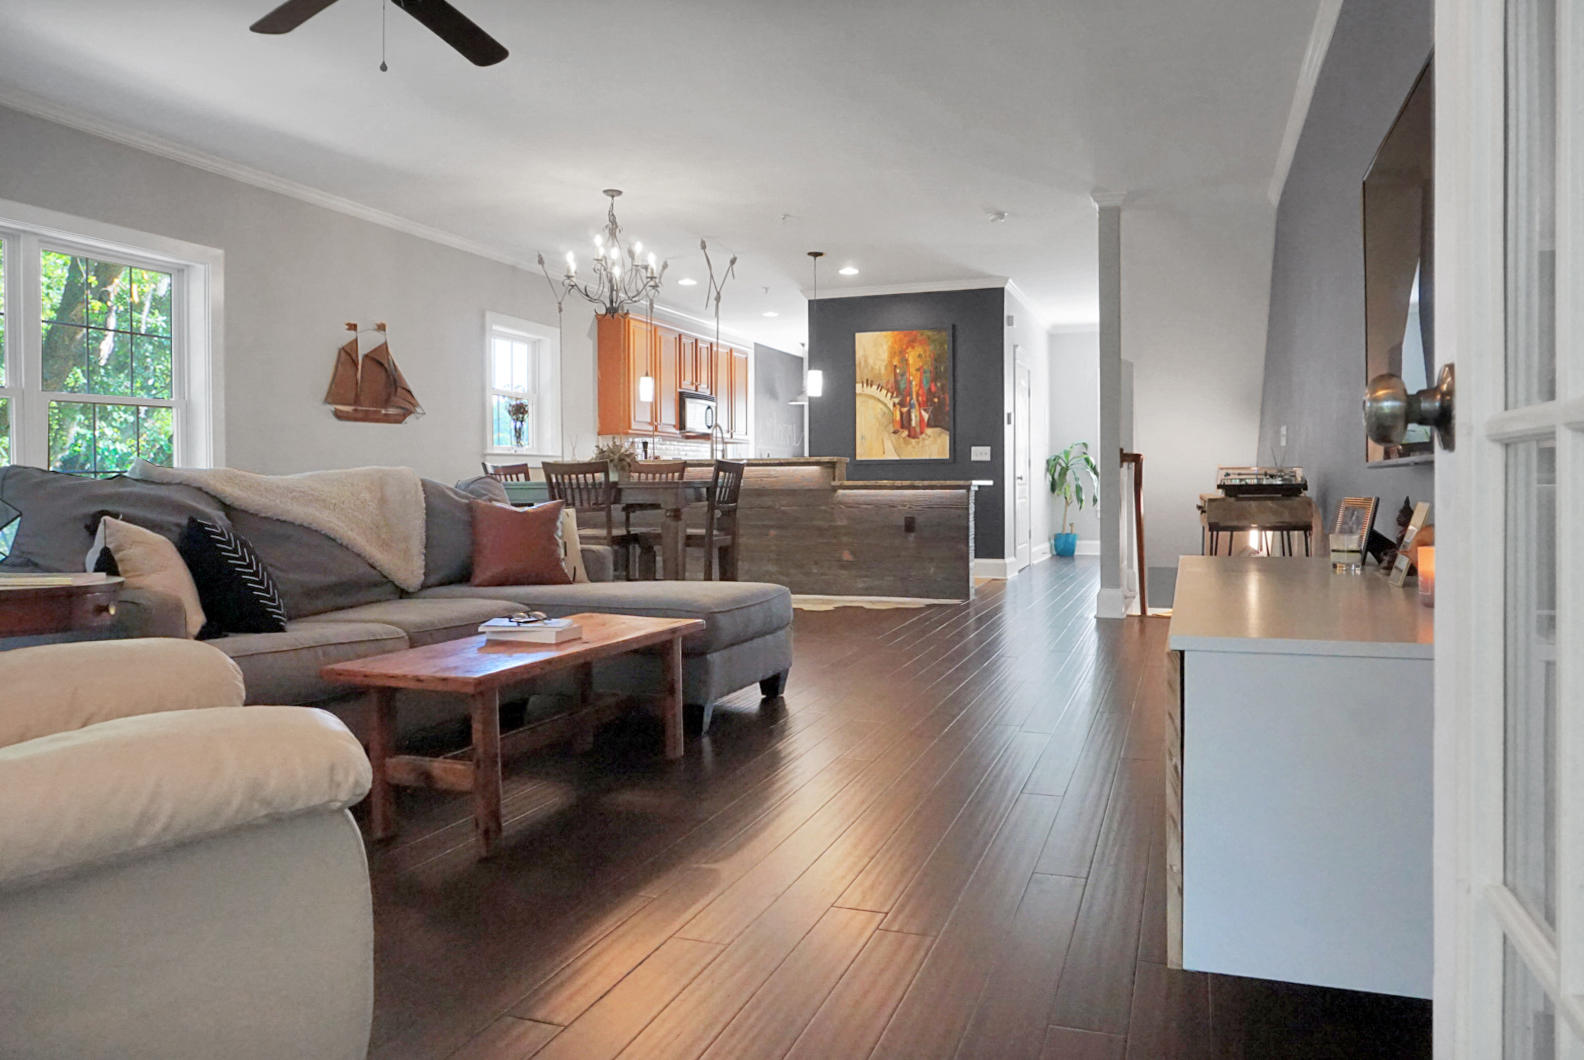 Etiwan Pointe Homes For Sale - 269 Etiwan Pointe, Mount Pleasant, SC - 50